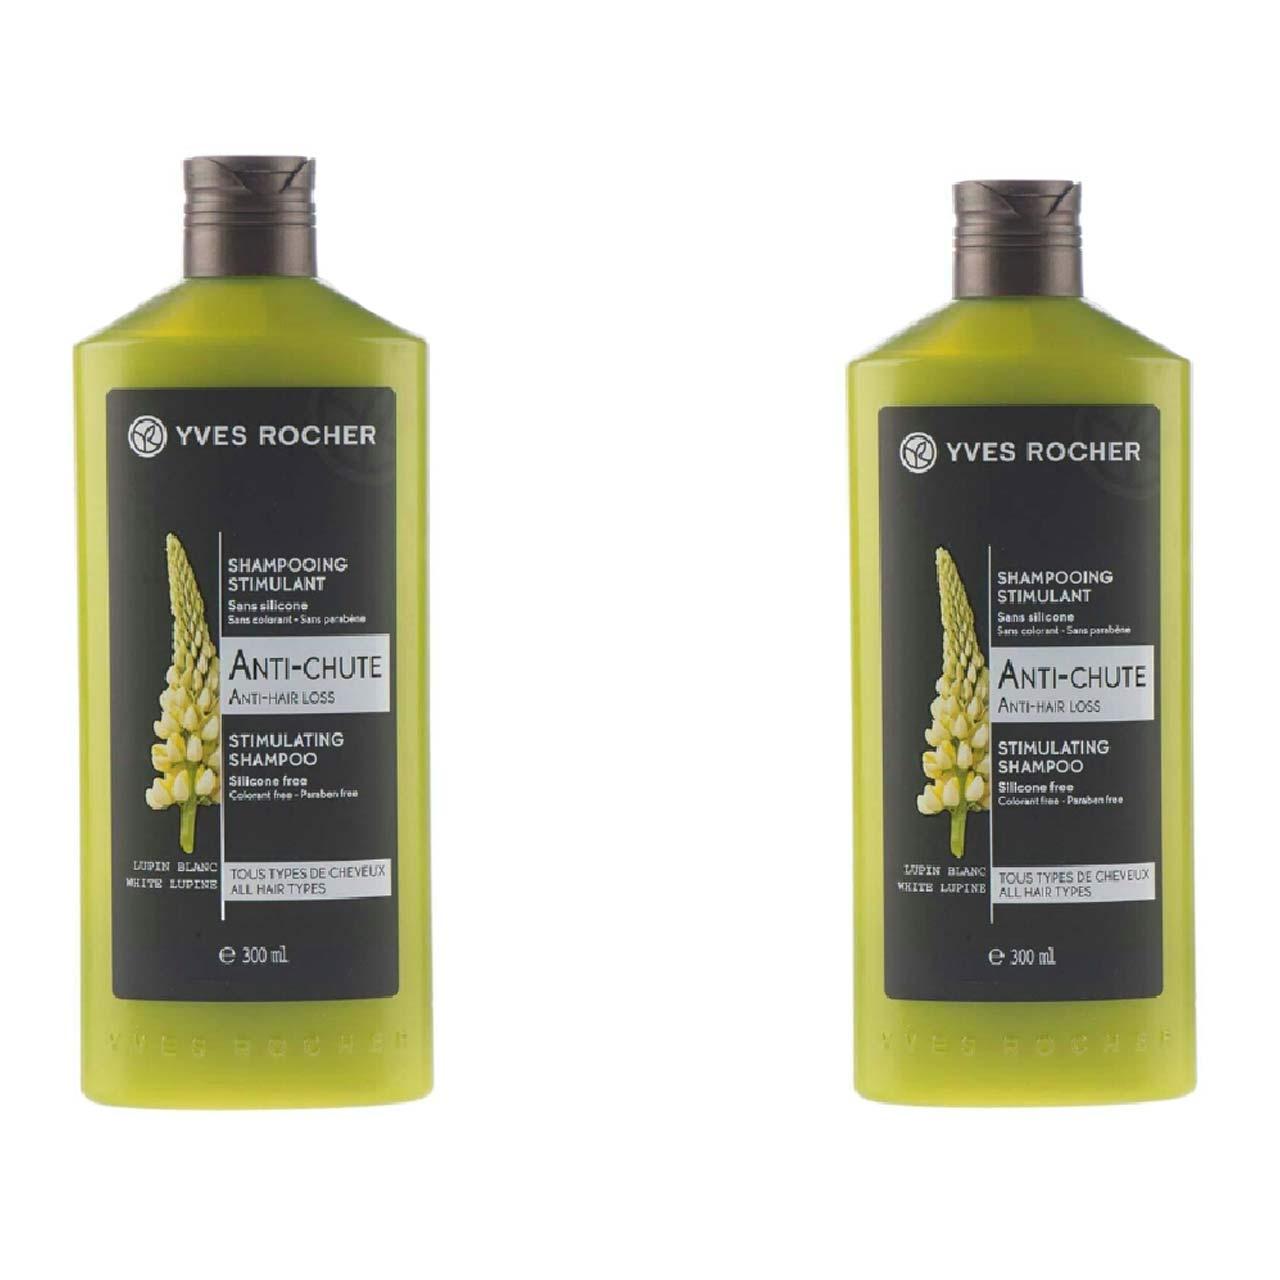 شامپو مو ایو روشه مدل Anti hair loss stimulating حجم 300 میلی لیتر بسته 2 عددی